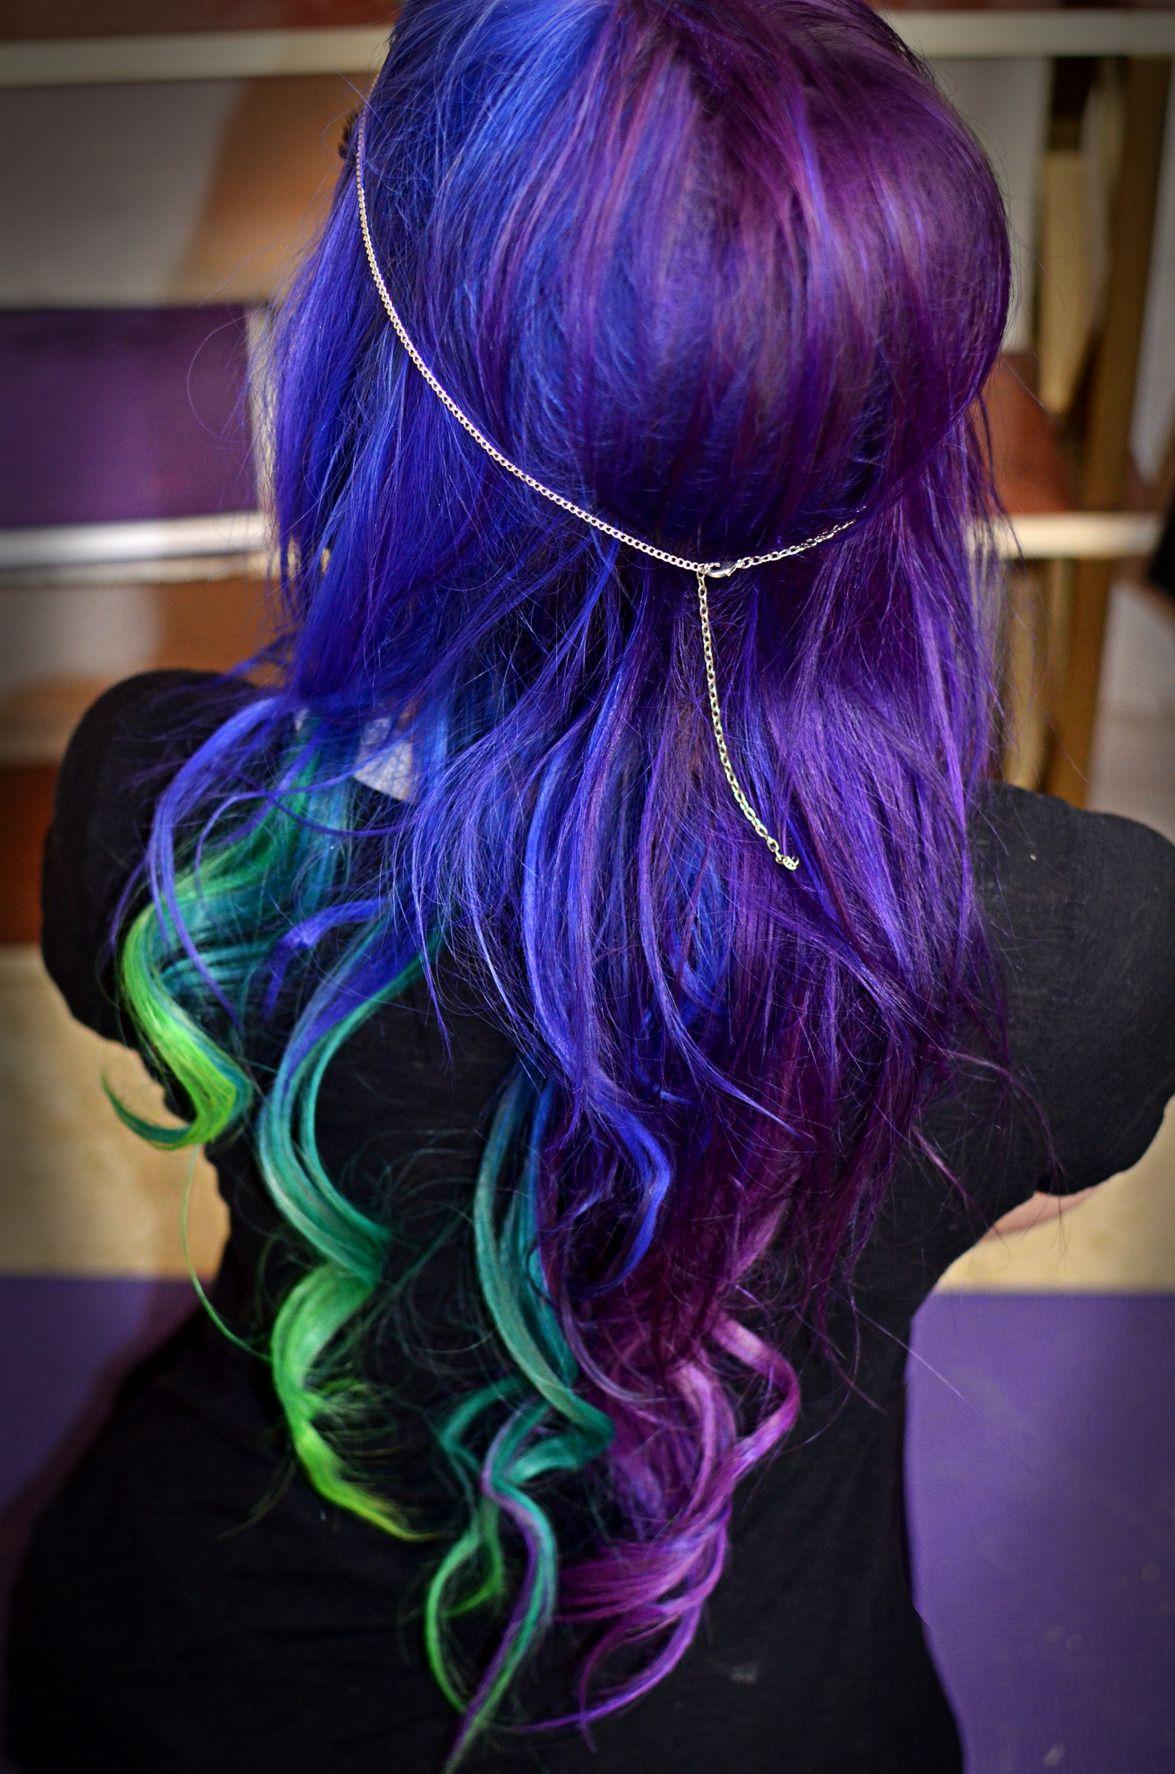 Blue purple dyed hair hair pinterest hair dyed hair and hair